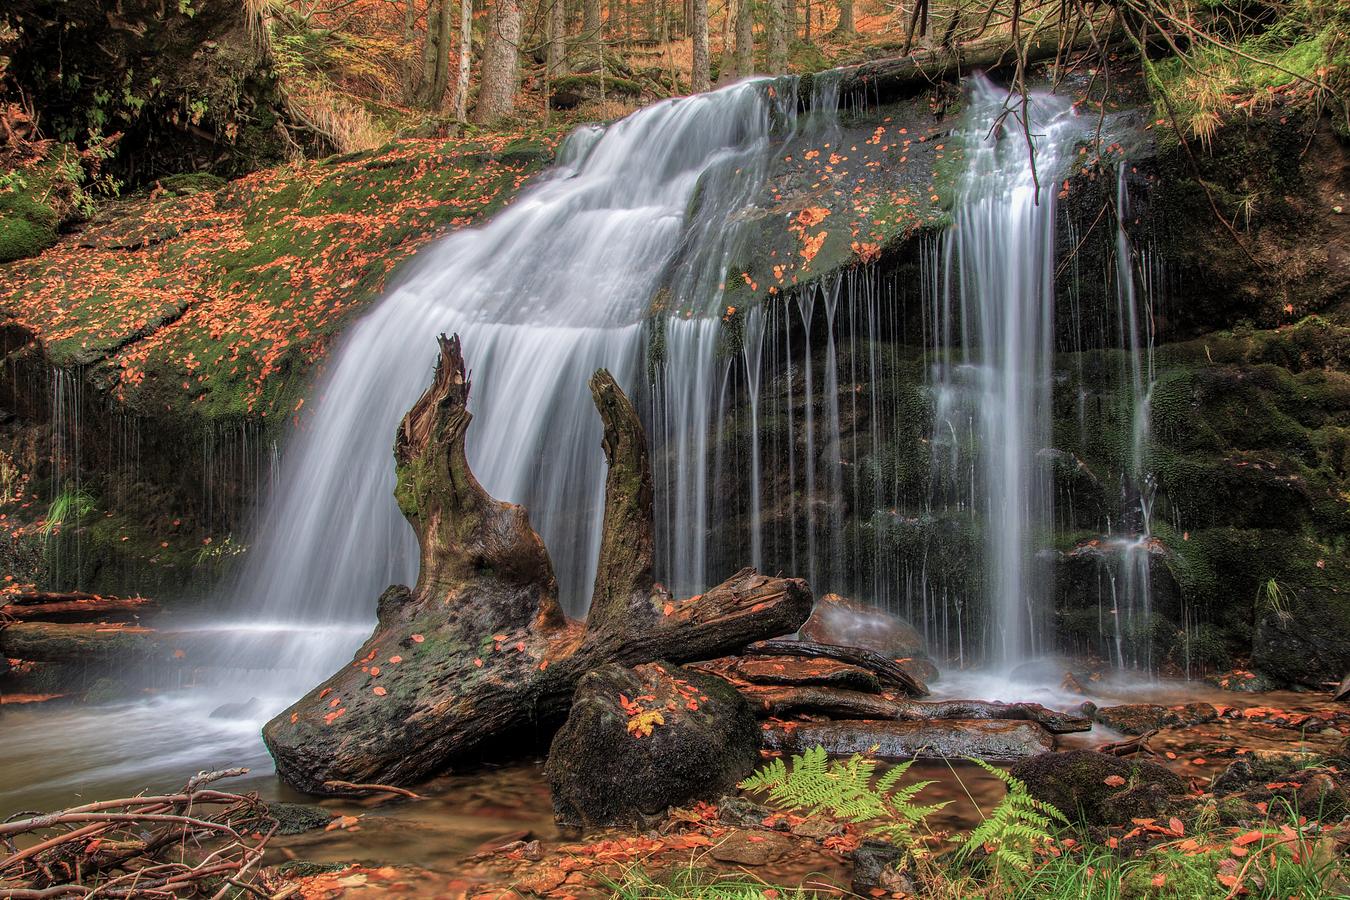 Vody Bavorského lesa